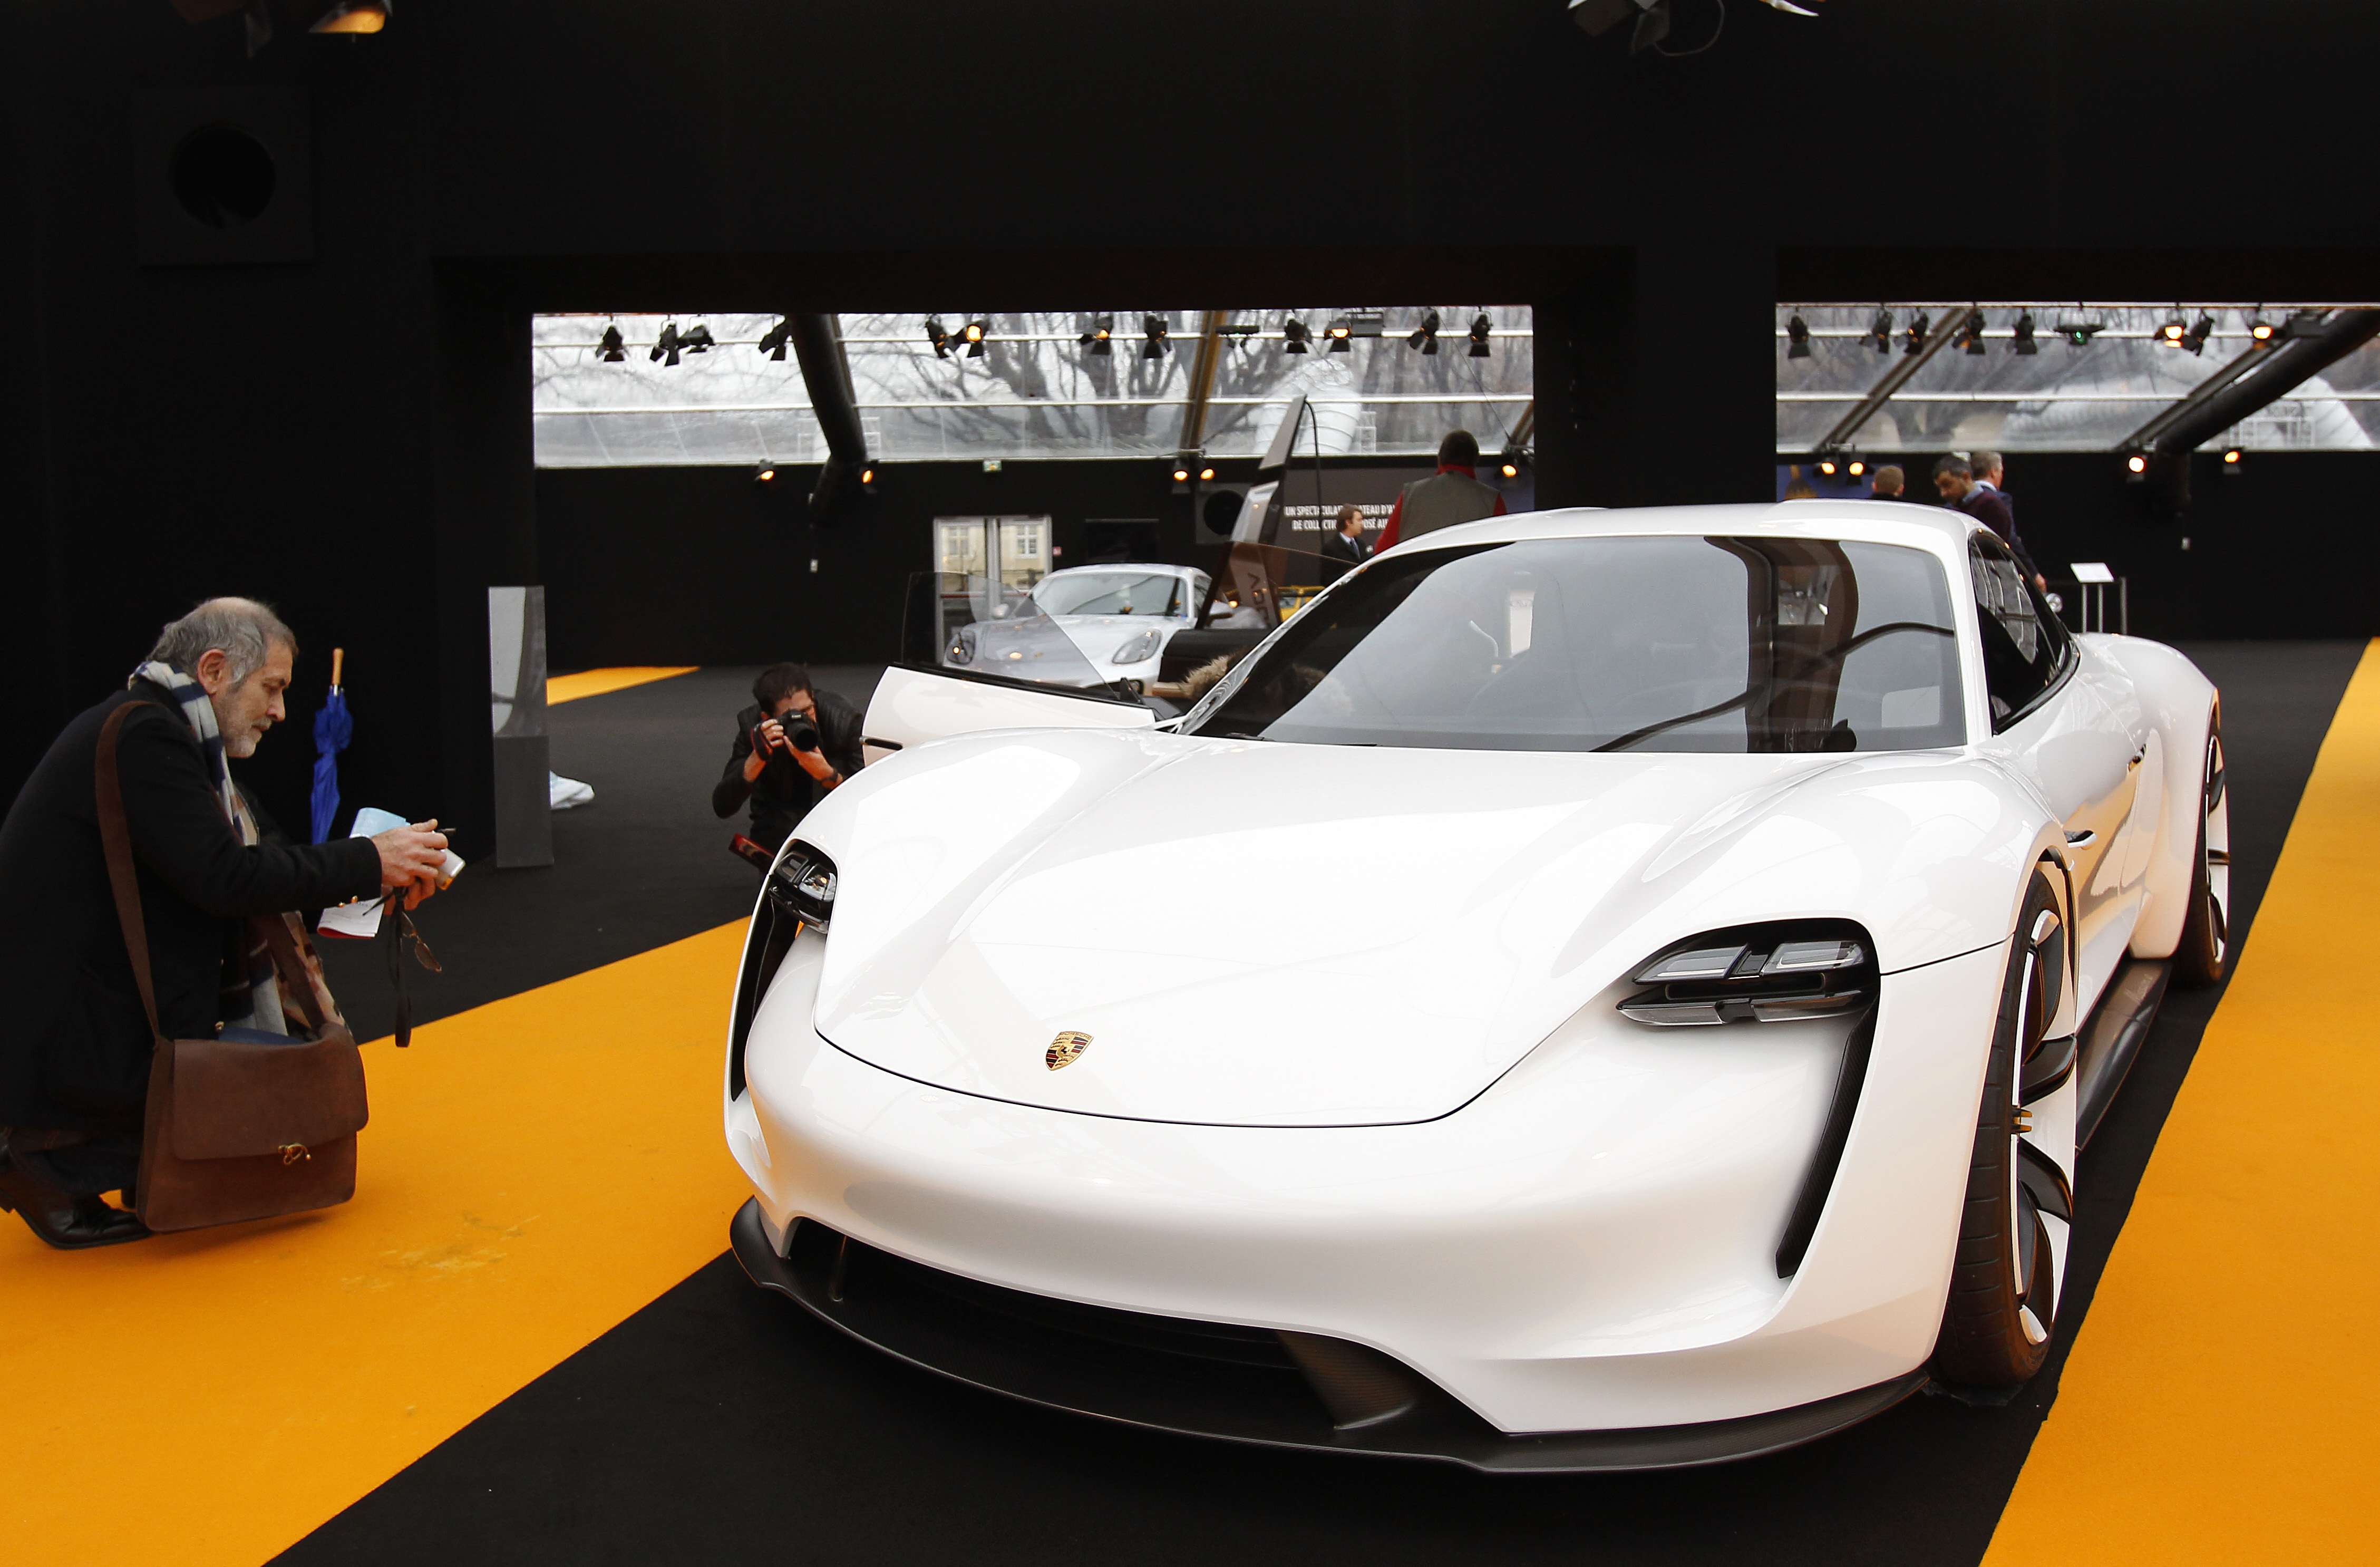 31st International  Automobile Festival At Hotel des Invalides In Paris